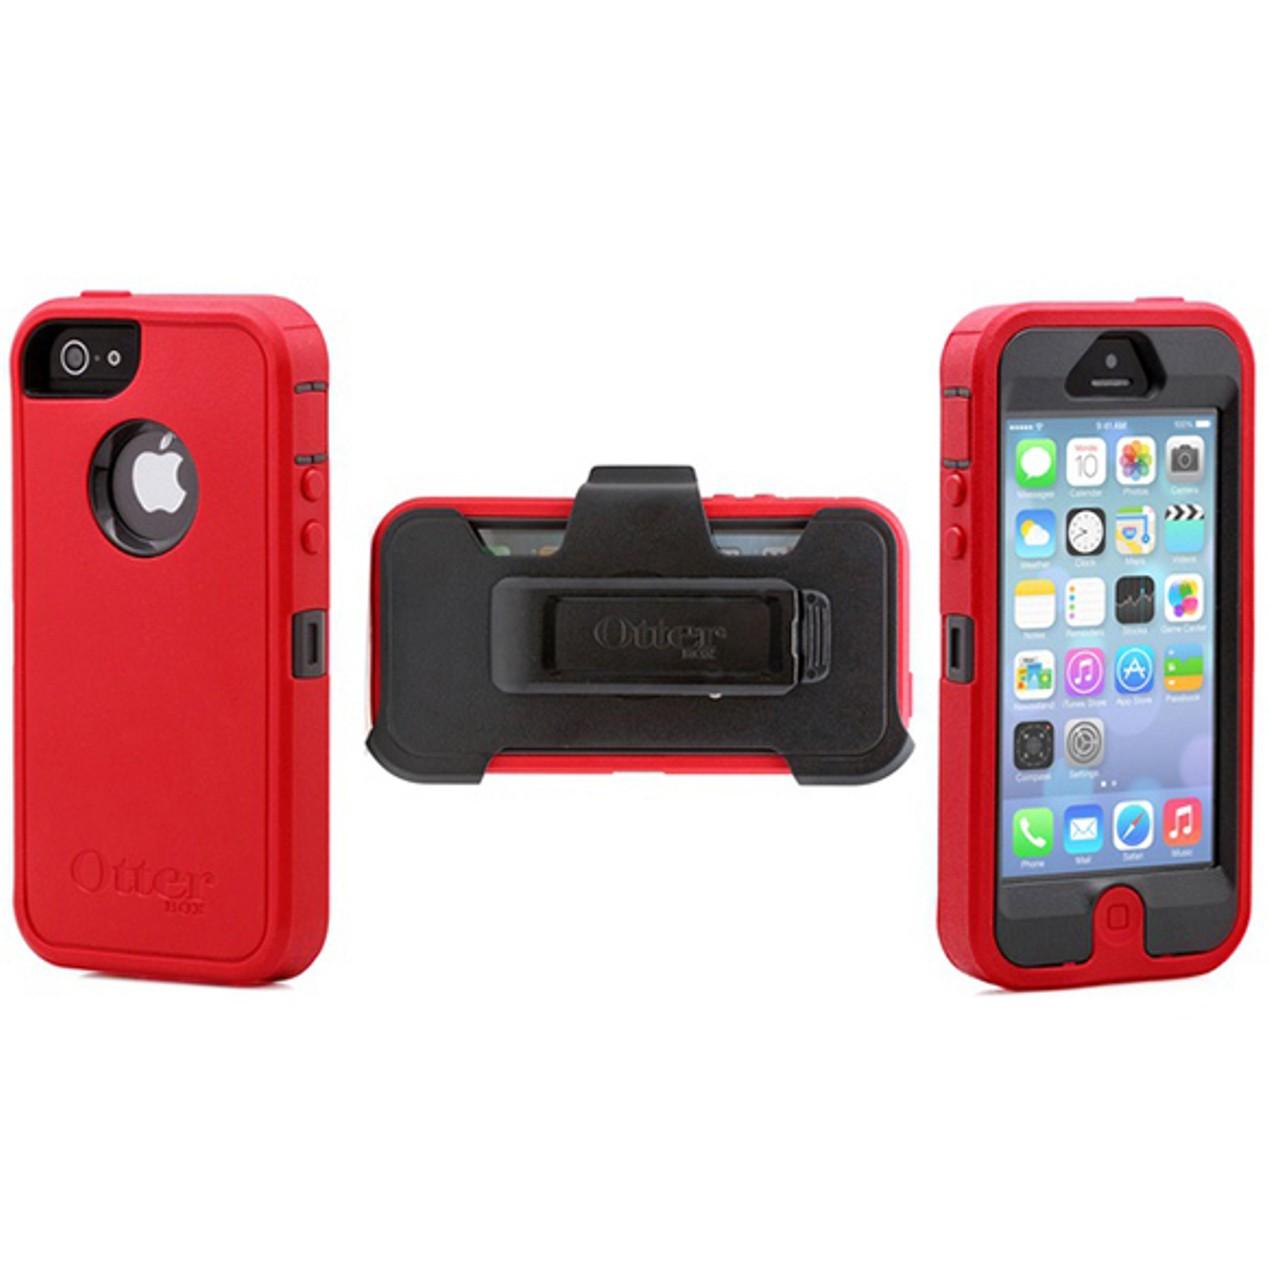 sale retailer 54d2f 8635f OtterBox Defender iPhone 5/5s Case - Tanga